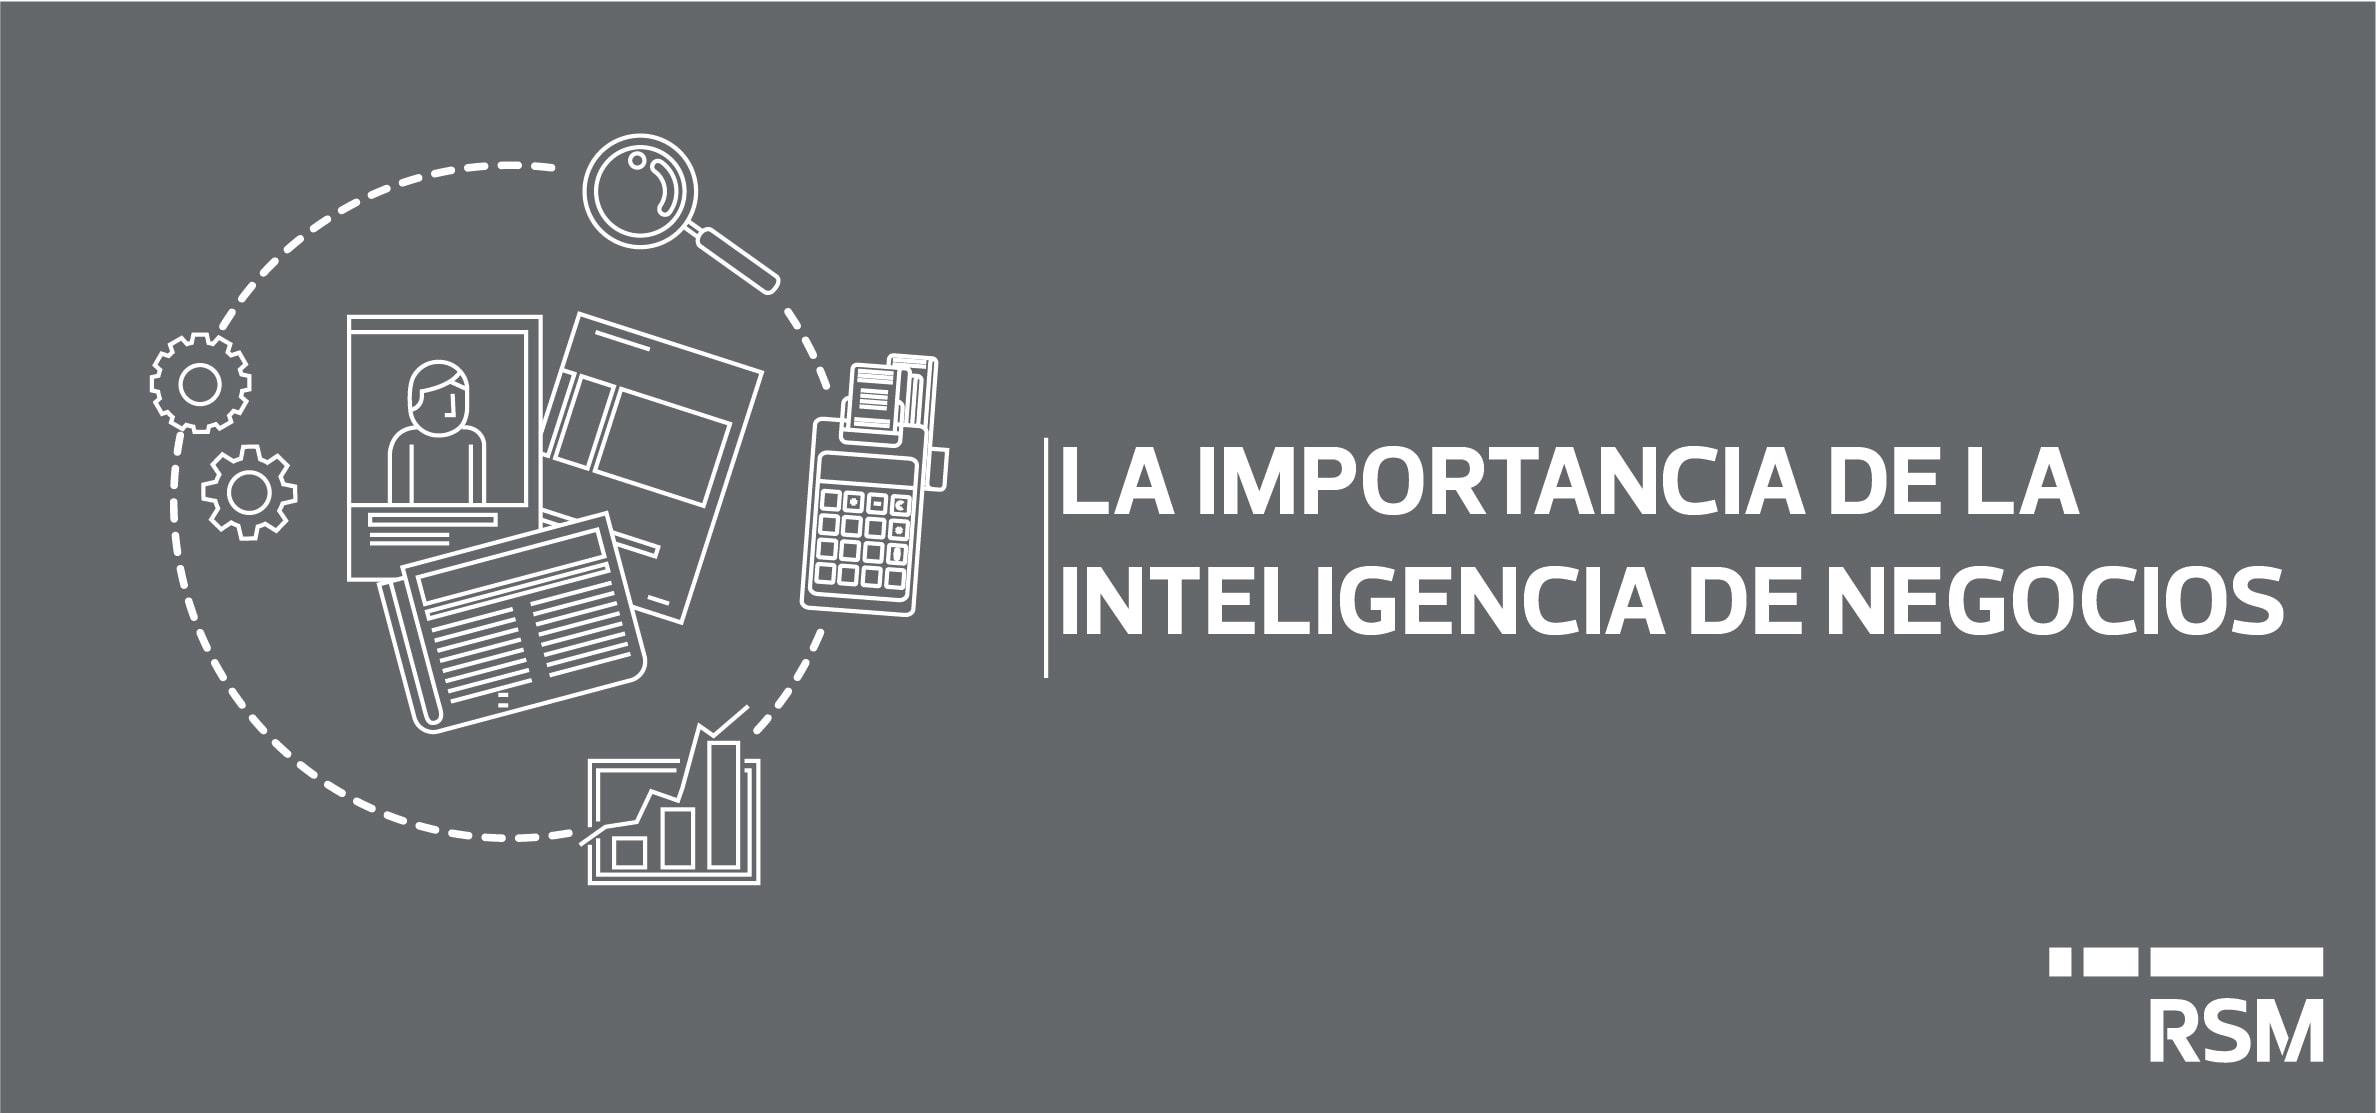 public://media/Lineas_negocio/consultoria/Insights/IMG/miniaturas_pagina_web_blogs-10.jpg